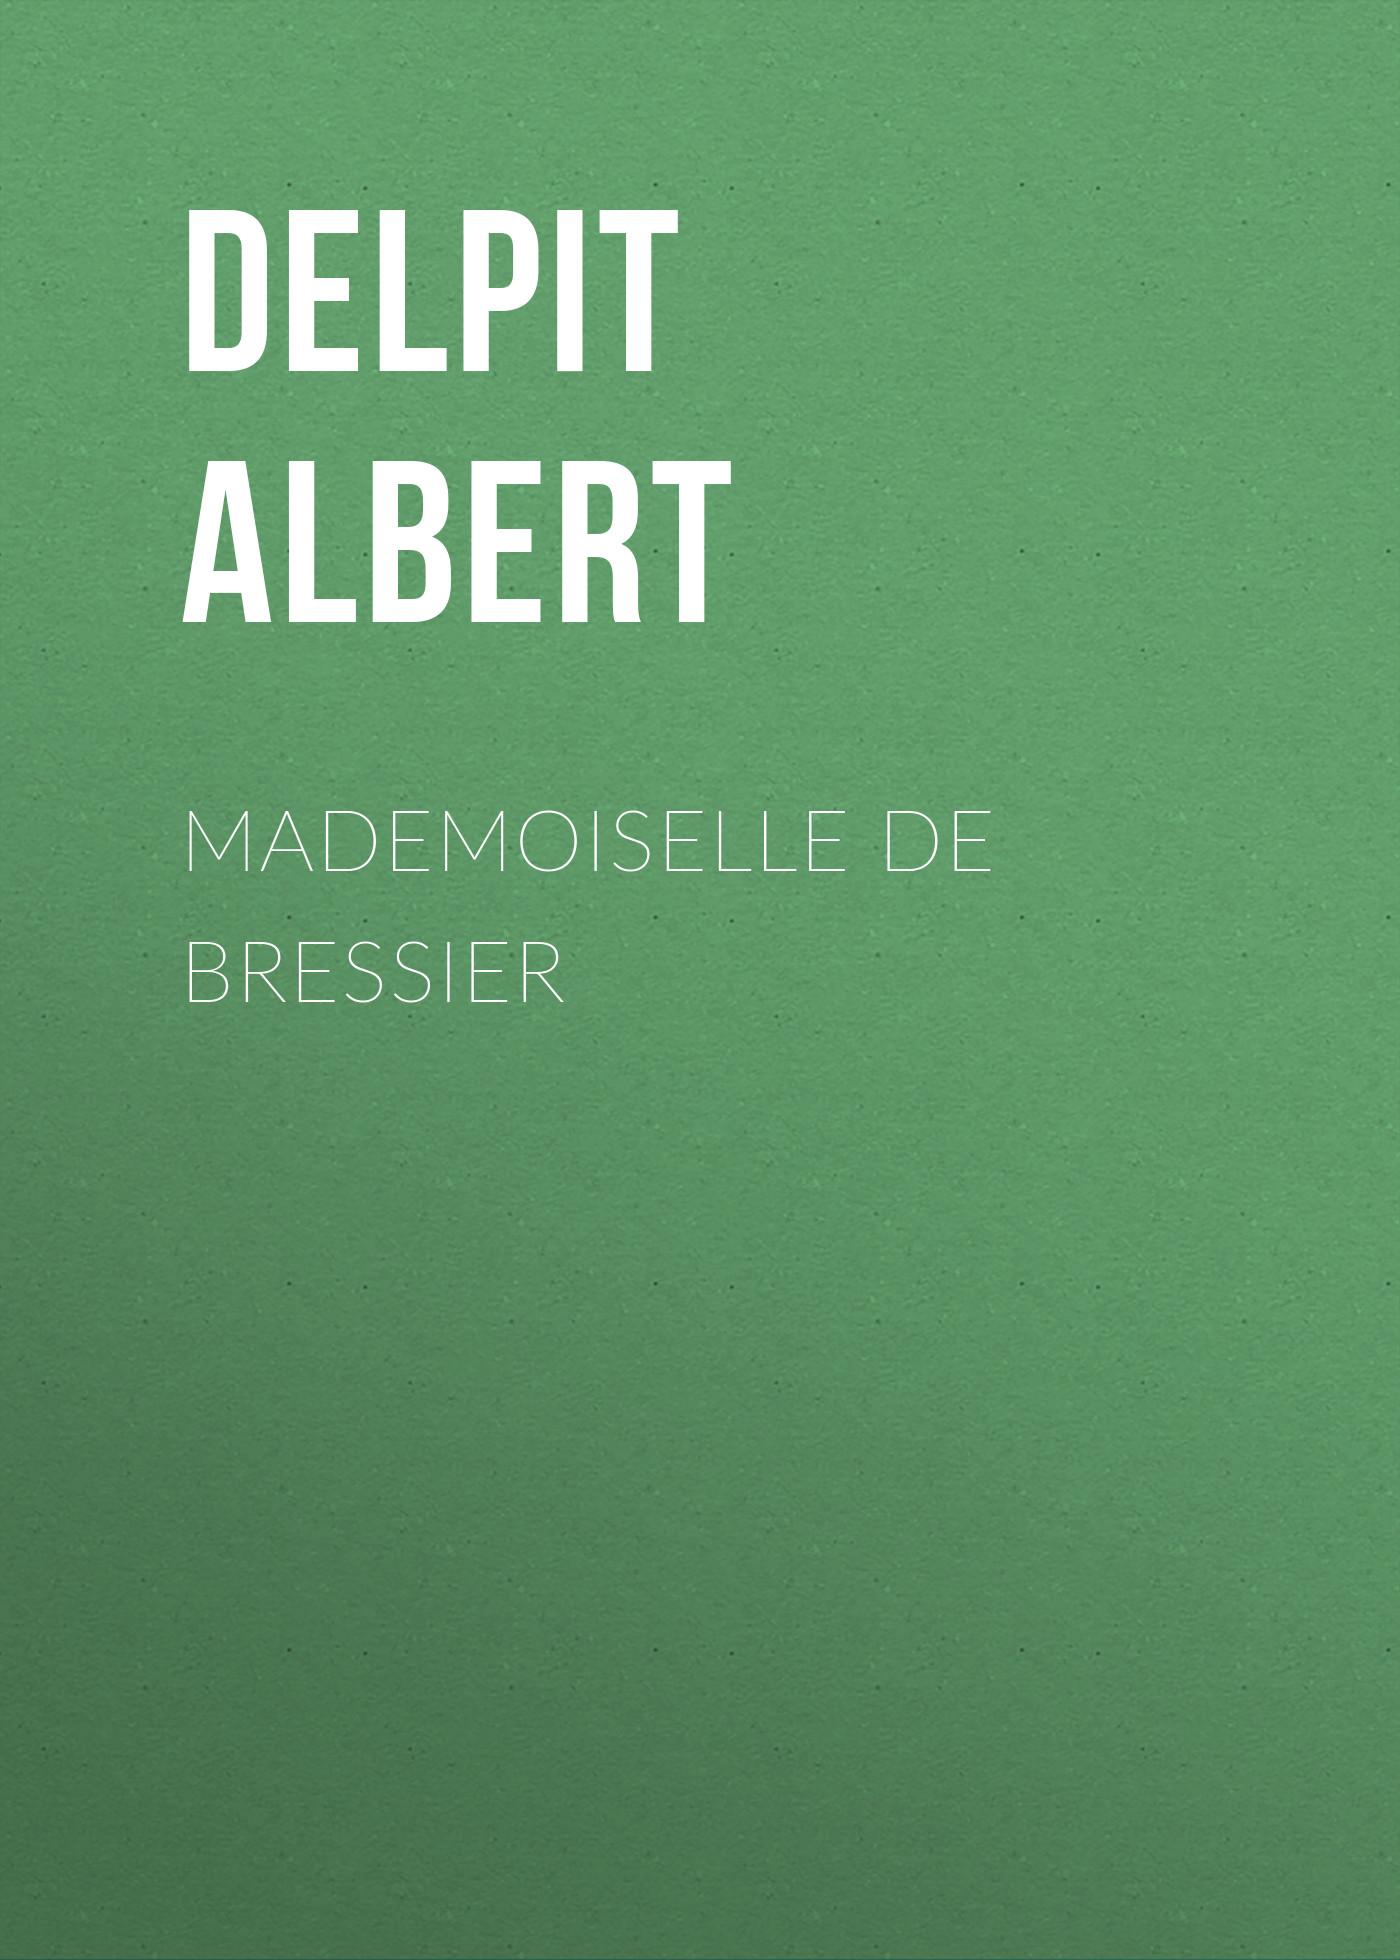 Delpit Albert Mademoiselle de Bressier джинсы муж new albert chino gas